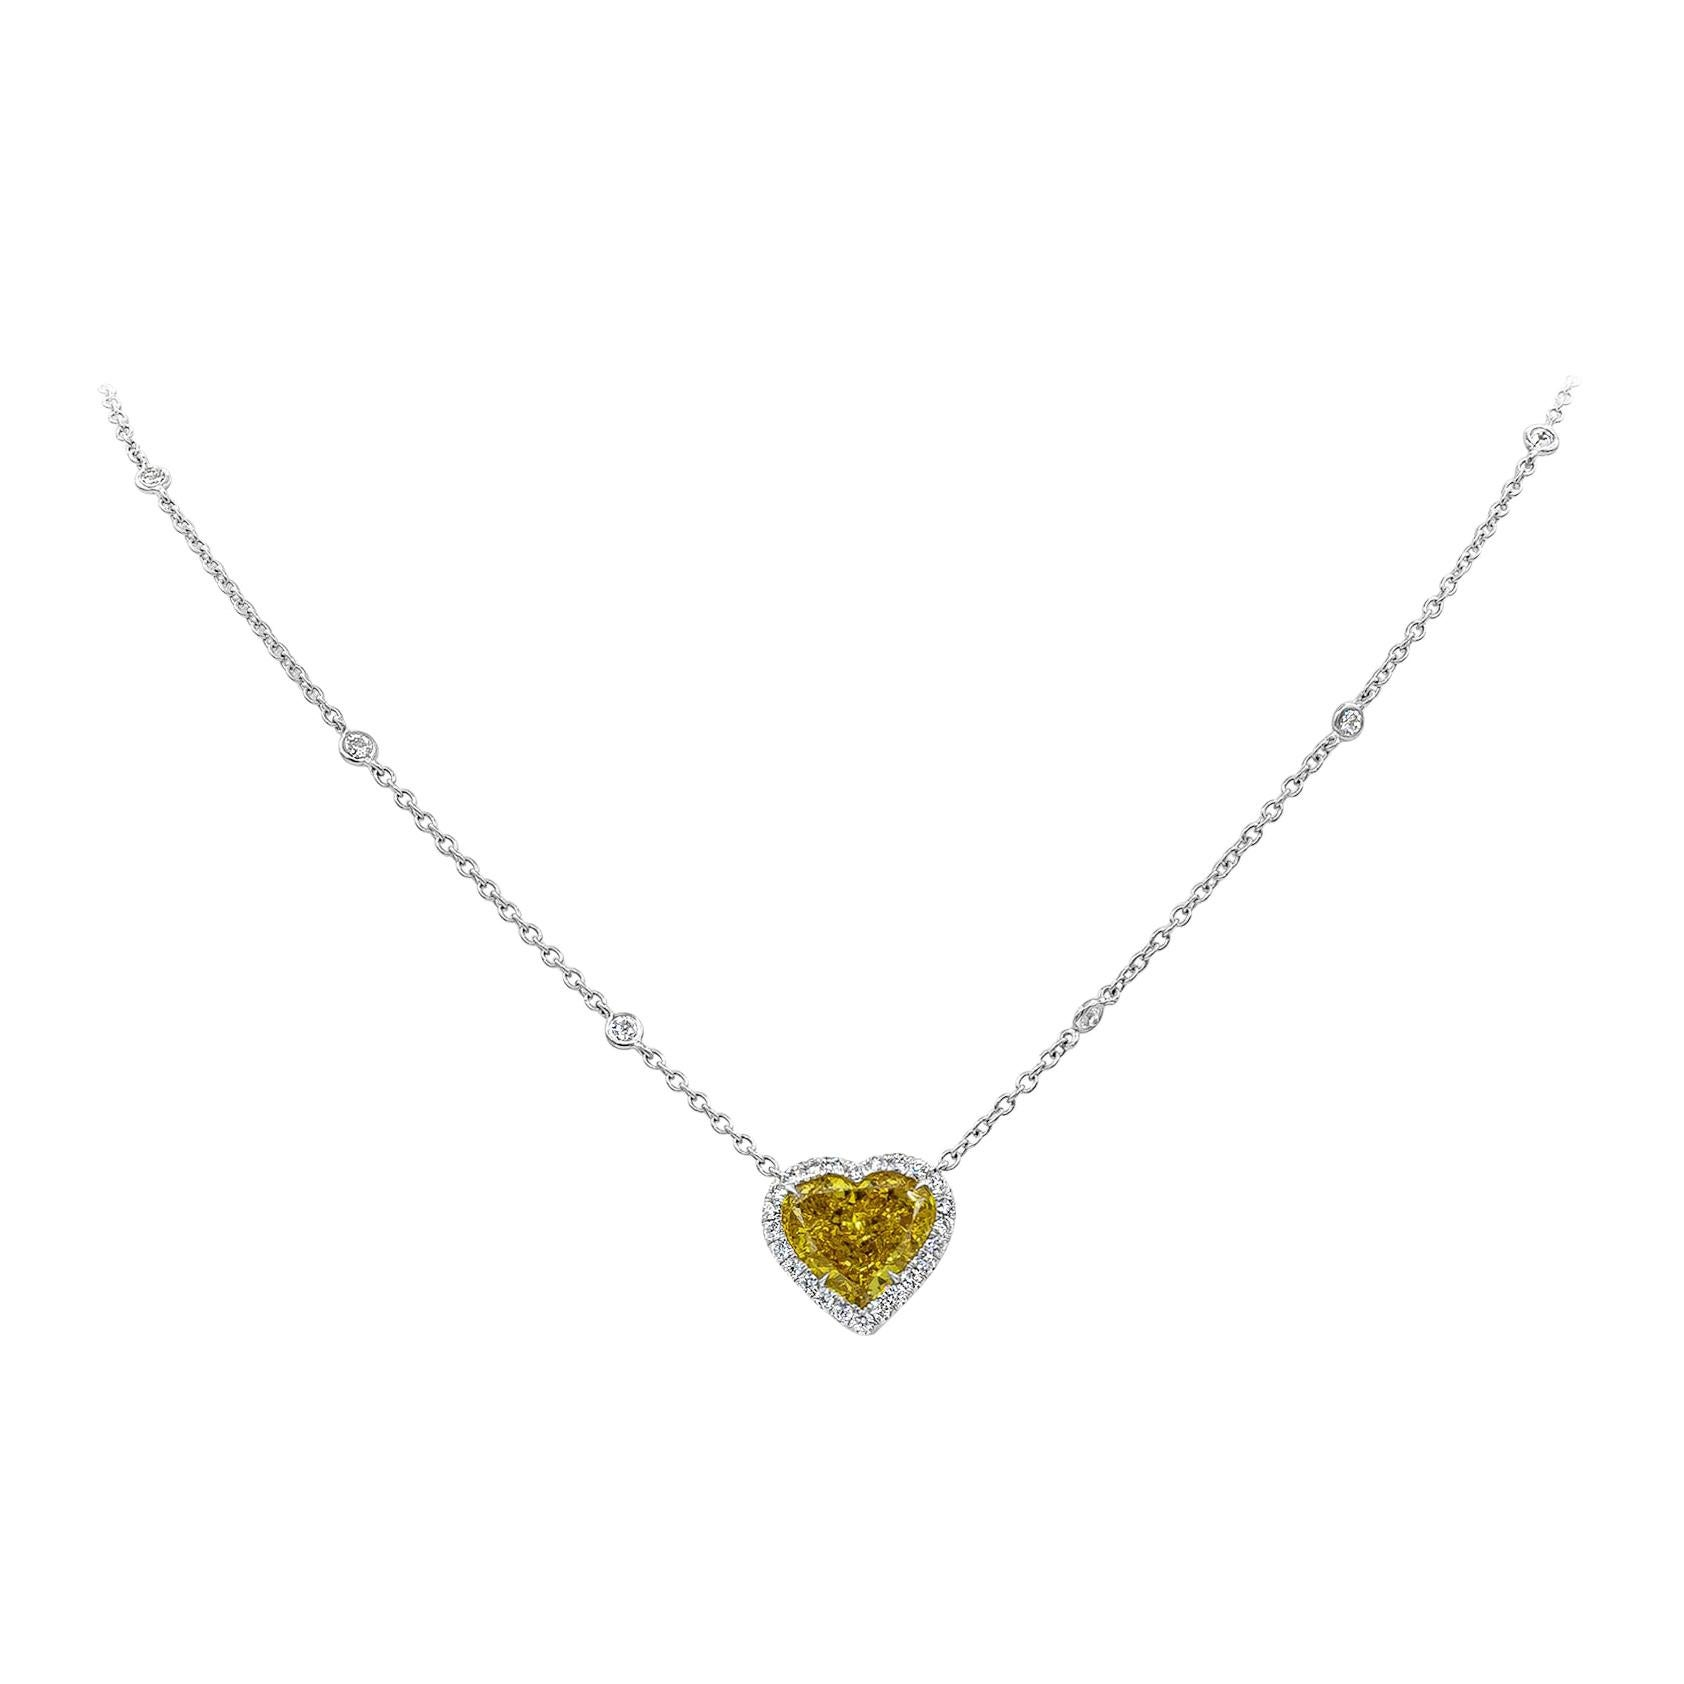 GIA Certified Fancy Deep Orangy Yellow Heart Diamond Halo Pendant Necklace